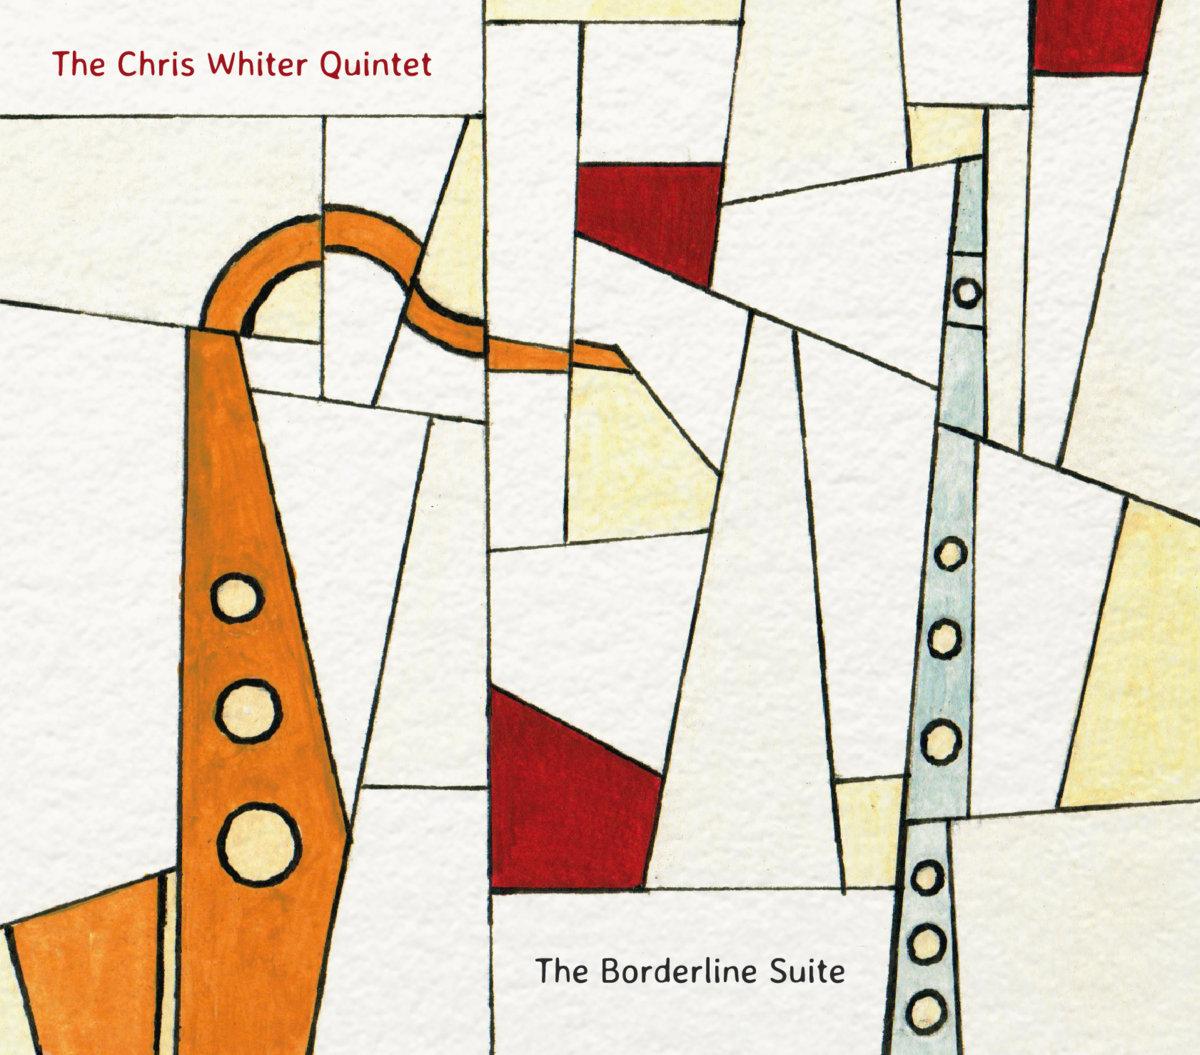 Republic Of Jazz Jun 7 2016 Cable Wiring Diagram Besides Bodine Electric Motor The Chris Whiter Quintet Borderline Suite